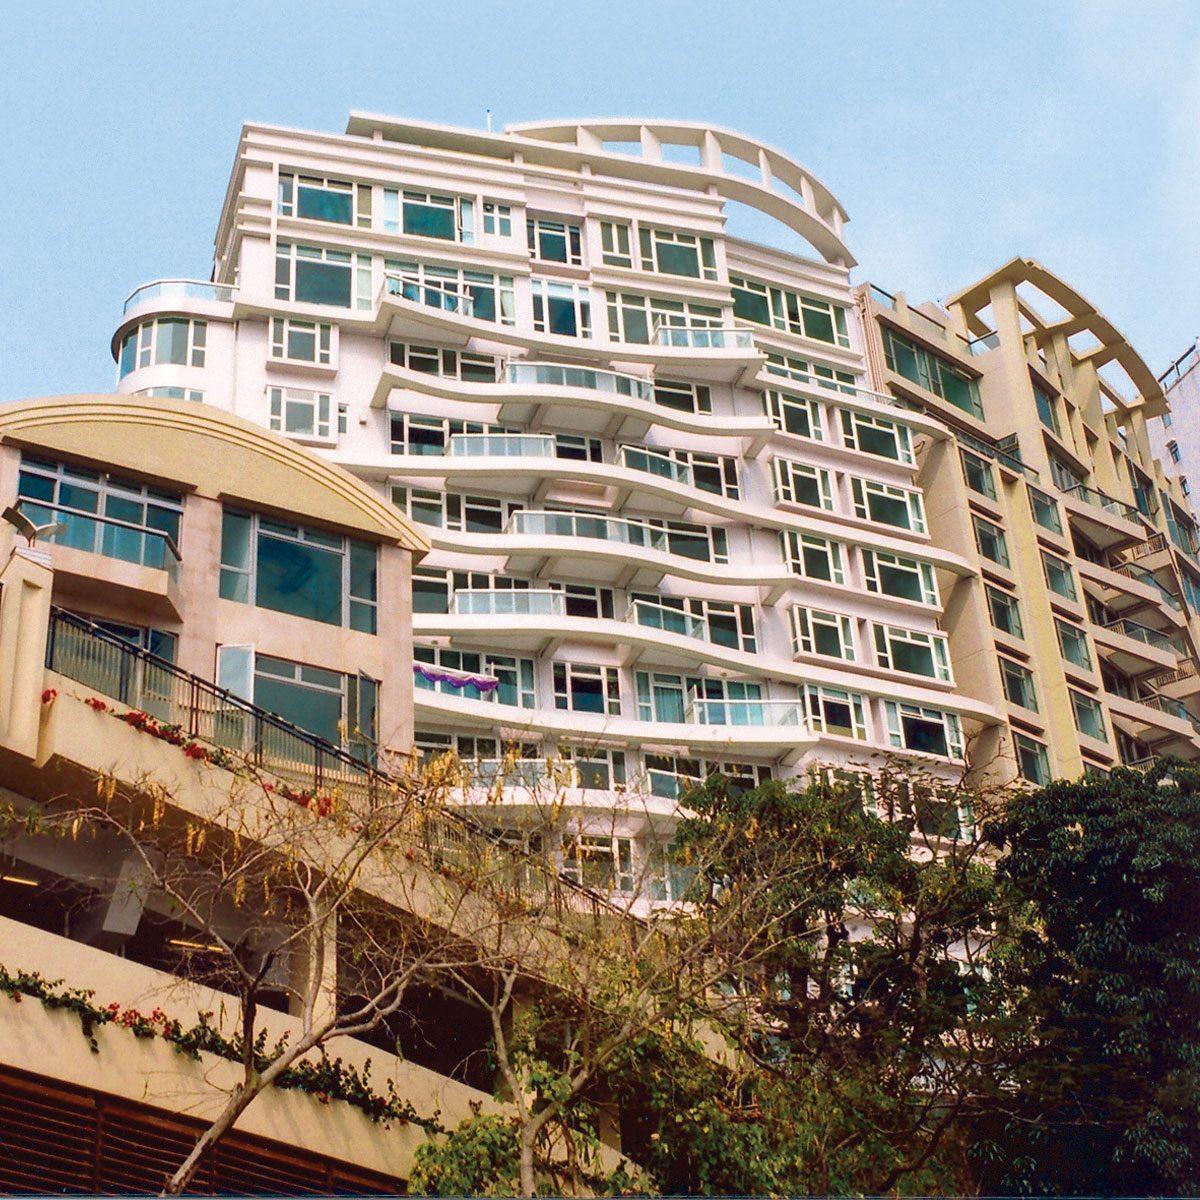 Villas Sorrento, Residential Development at 64-66 Mount Davis Road, Hong Kong